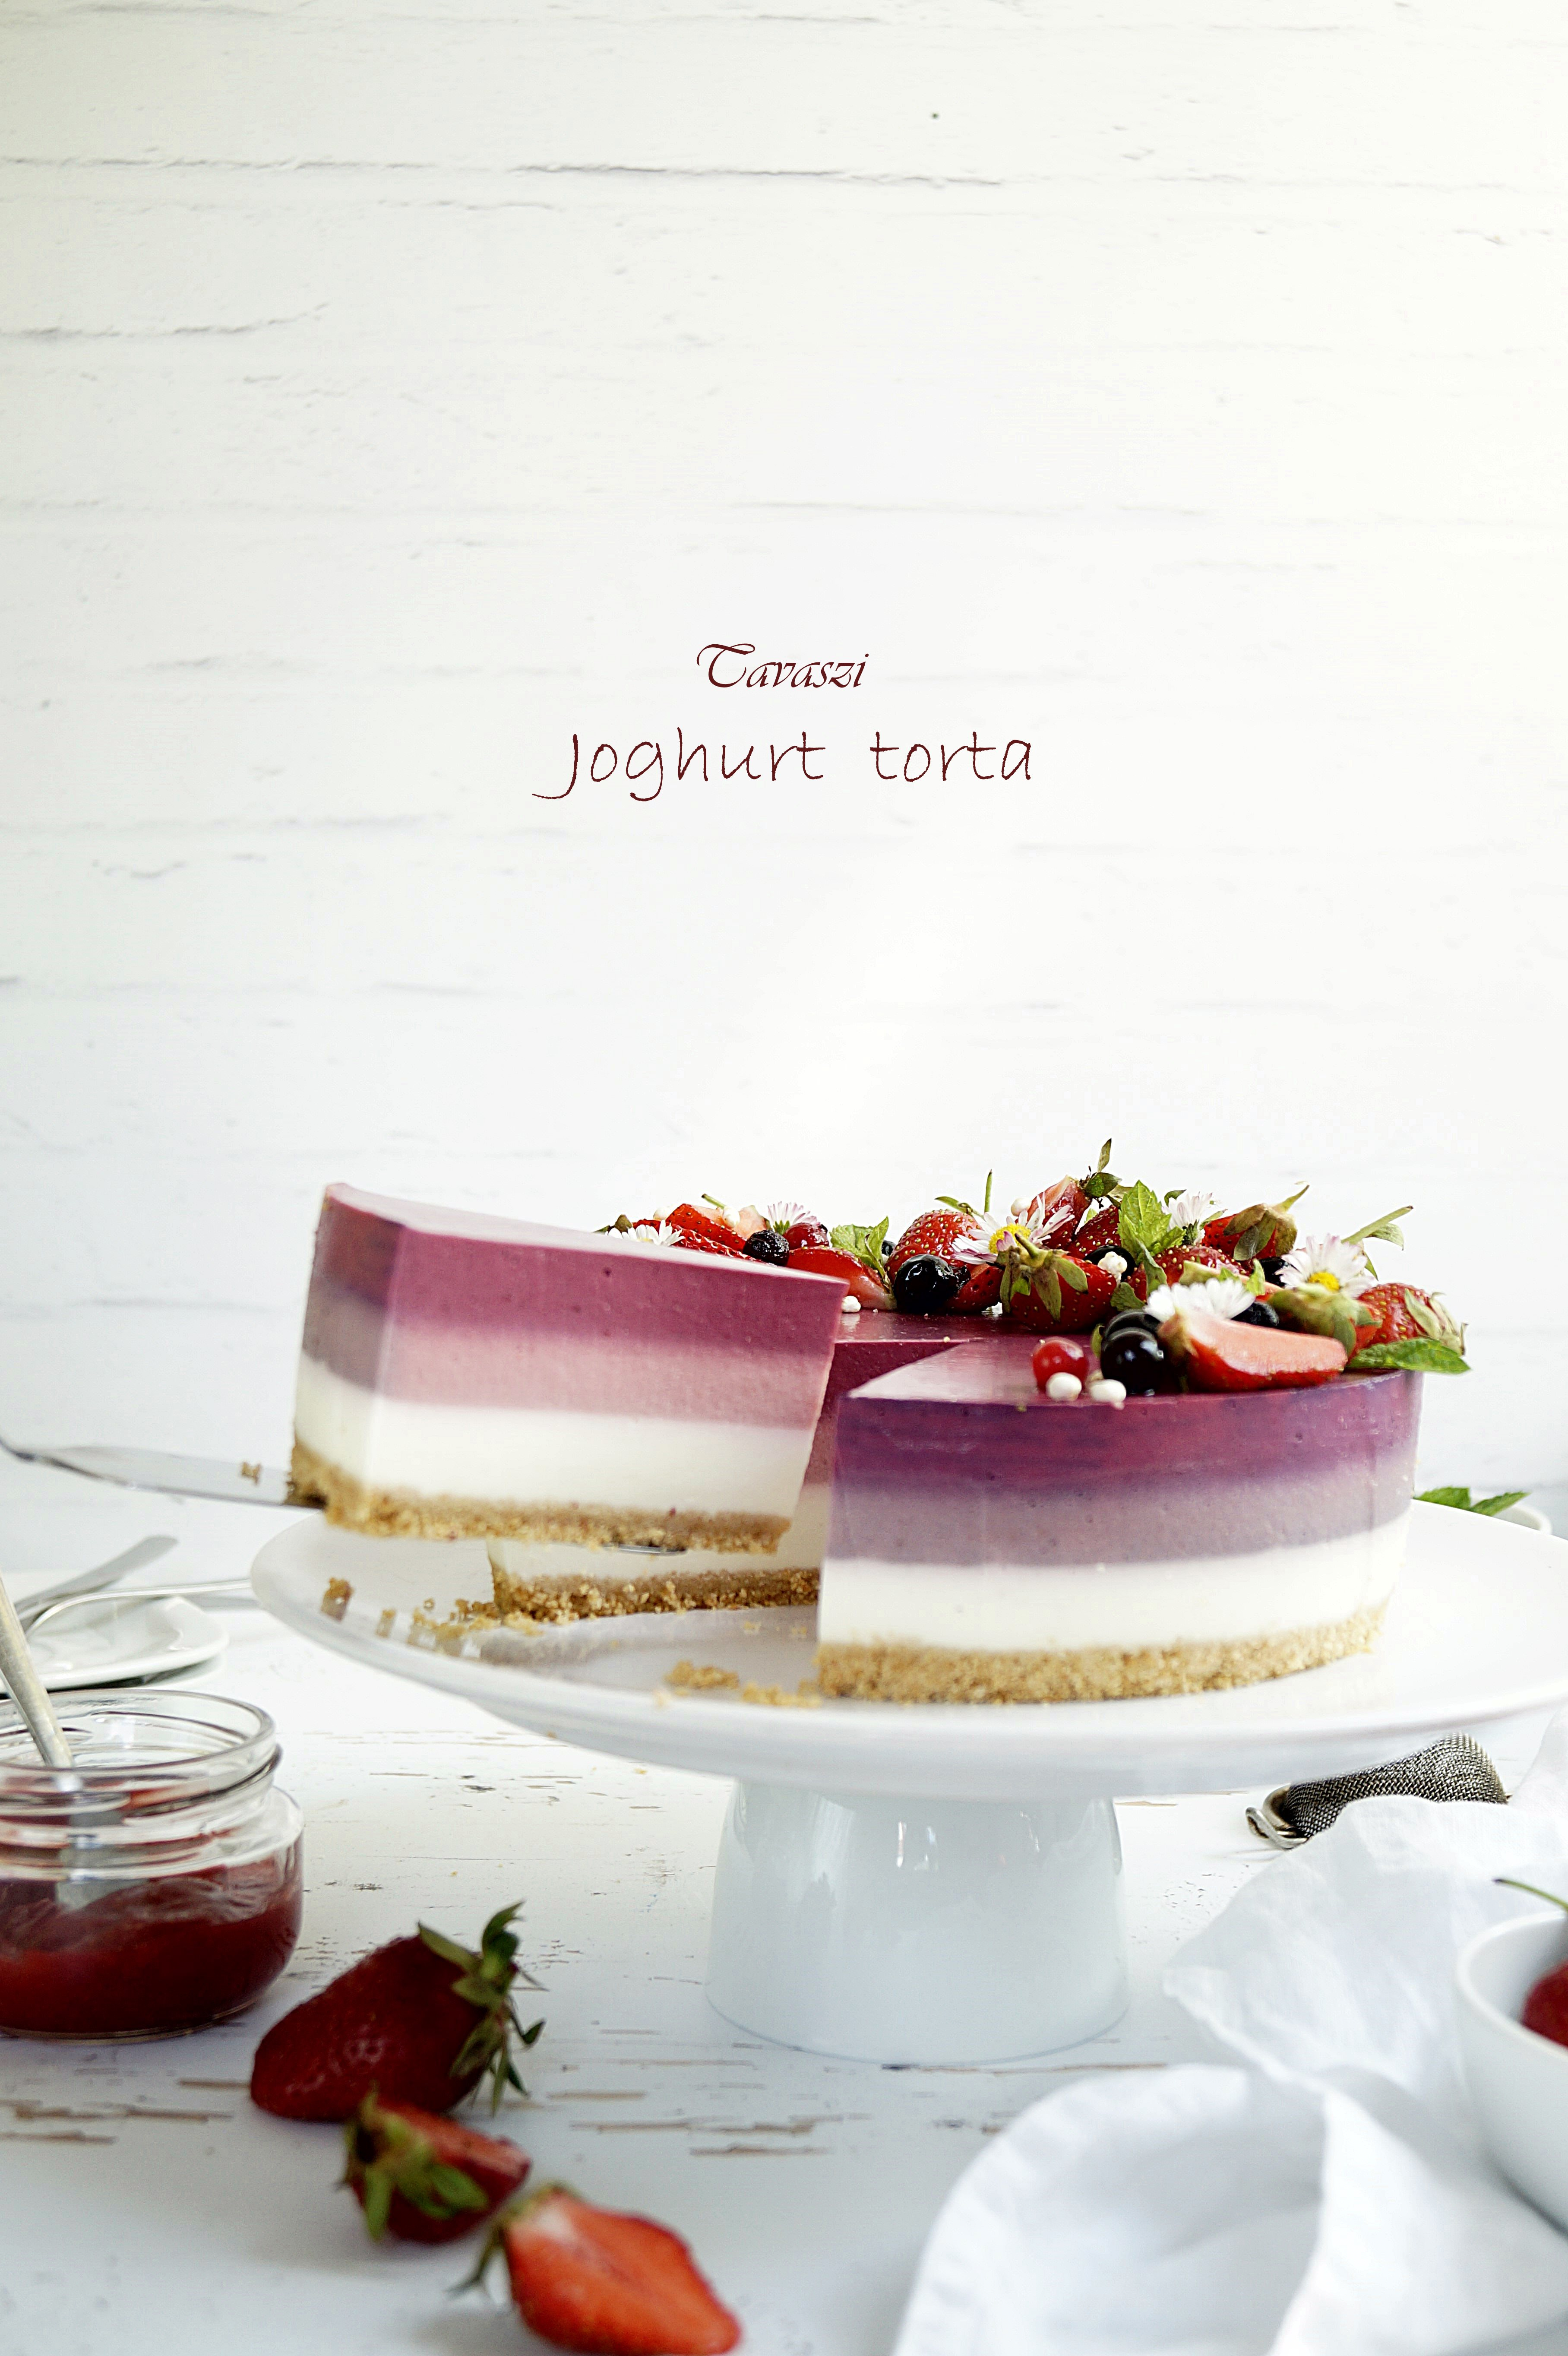 joghurt_torta_szoveg1.jpg